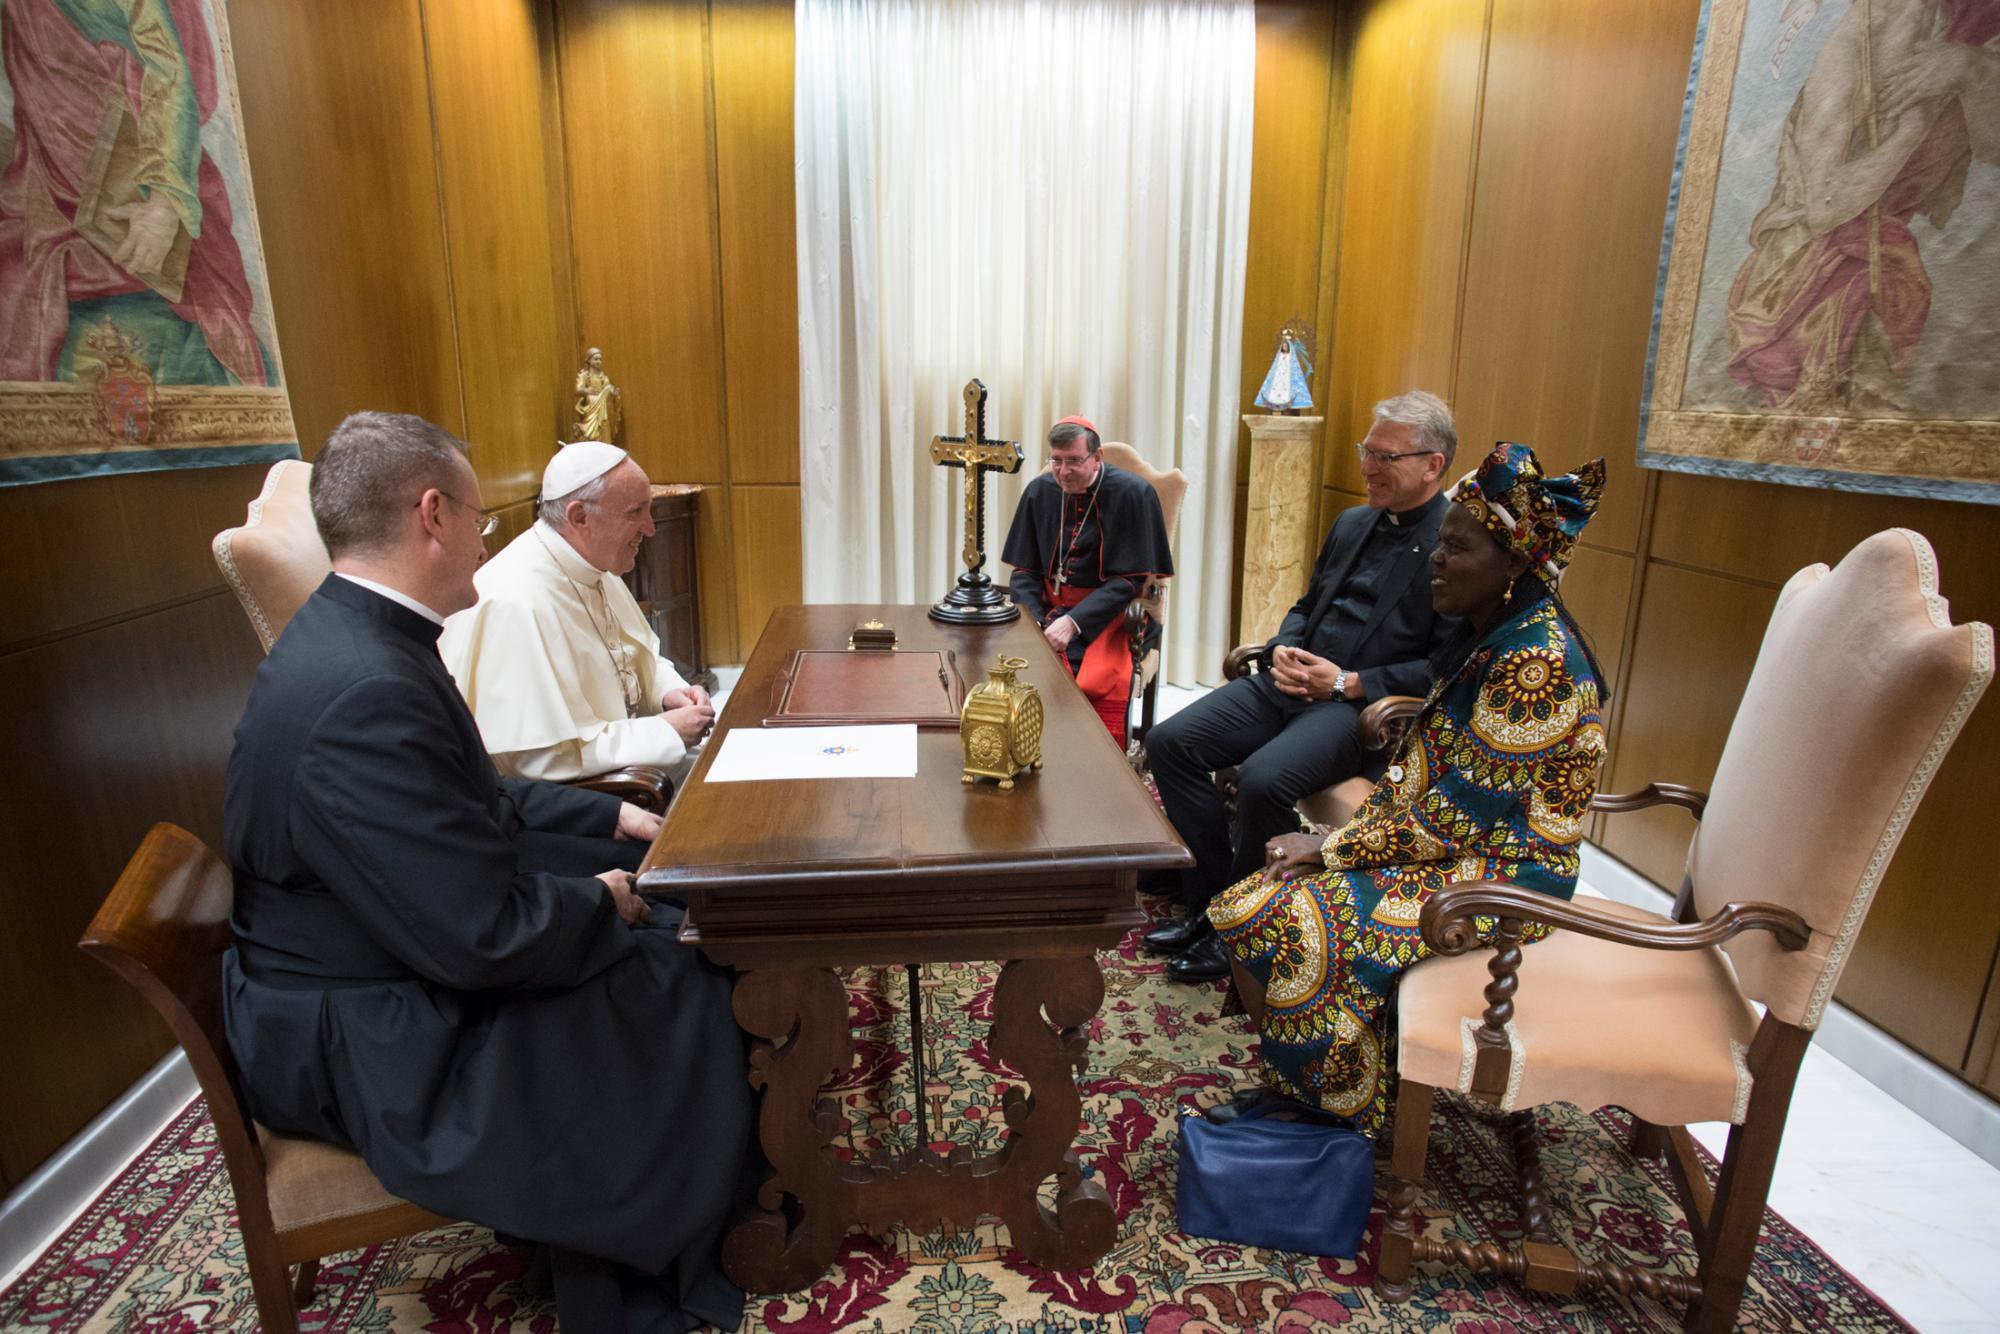 Fykse Tveit bij paus Franciscus © Francesco Sforza/Vatican Photographic Service/WVV